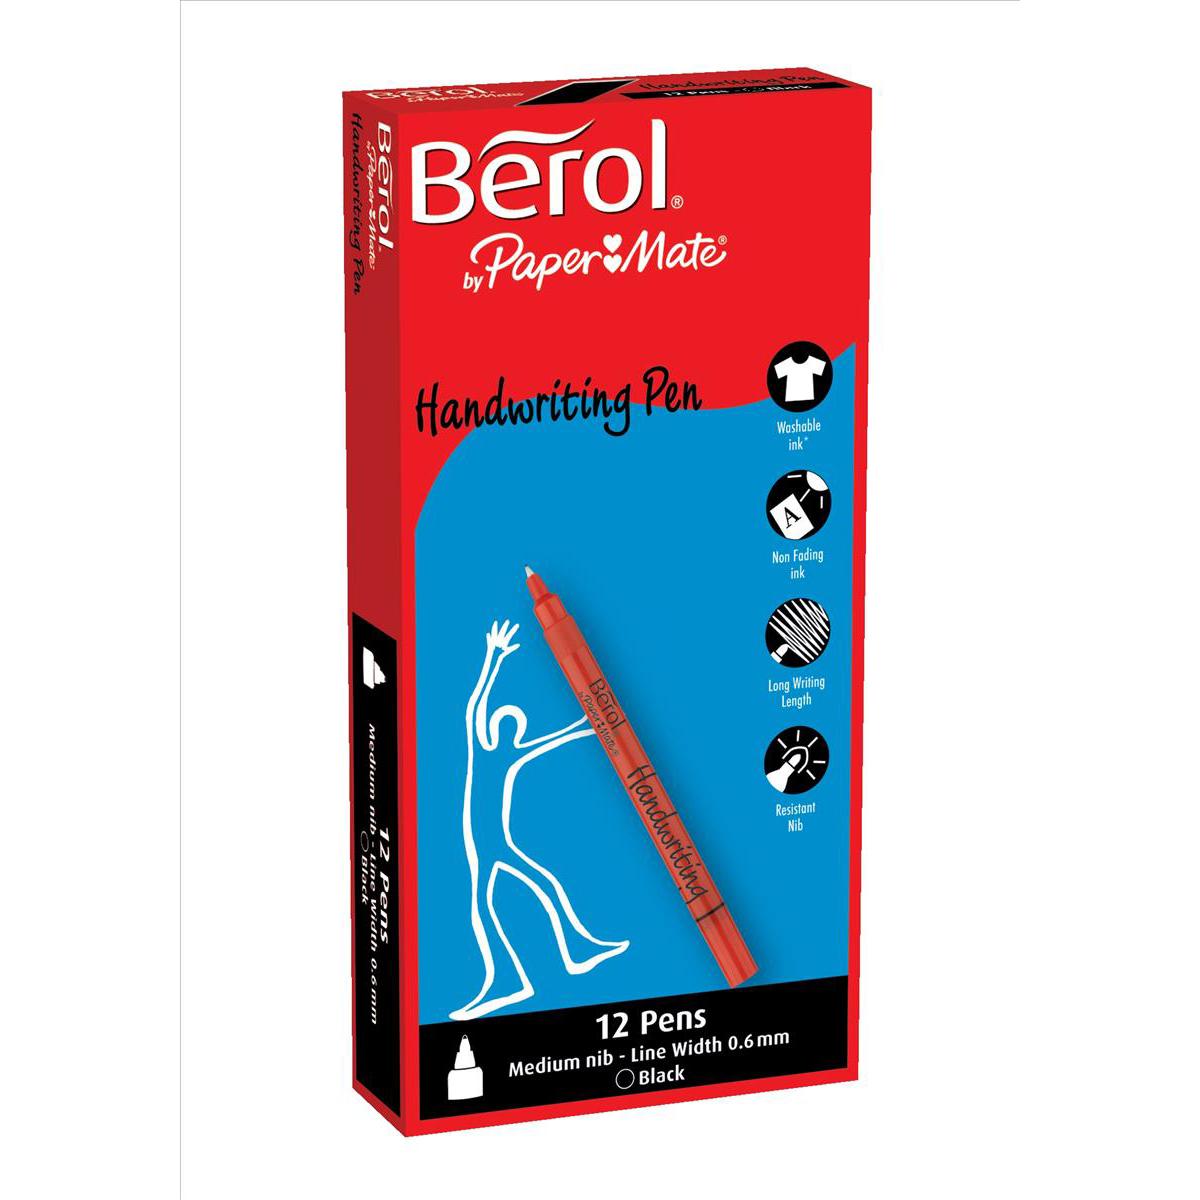 Berol Handwriting Pen Water-based Ink Plastic Black Ref S0378750 Pack 144 Bulk Pack Jan-Dec 2018